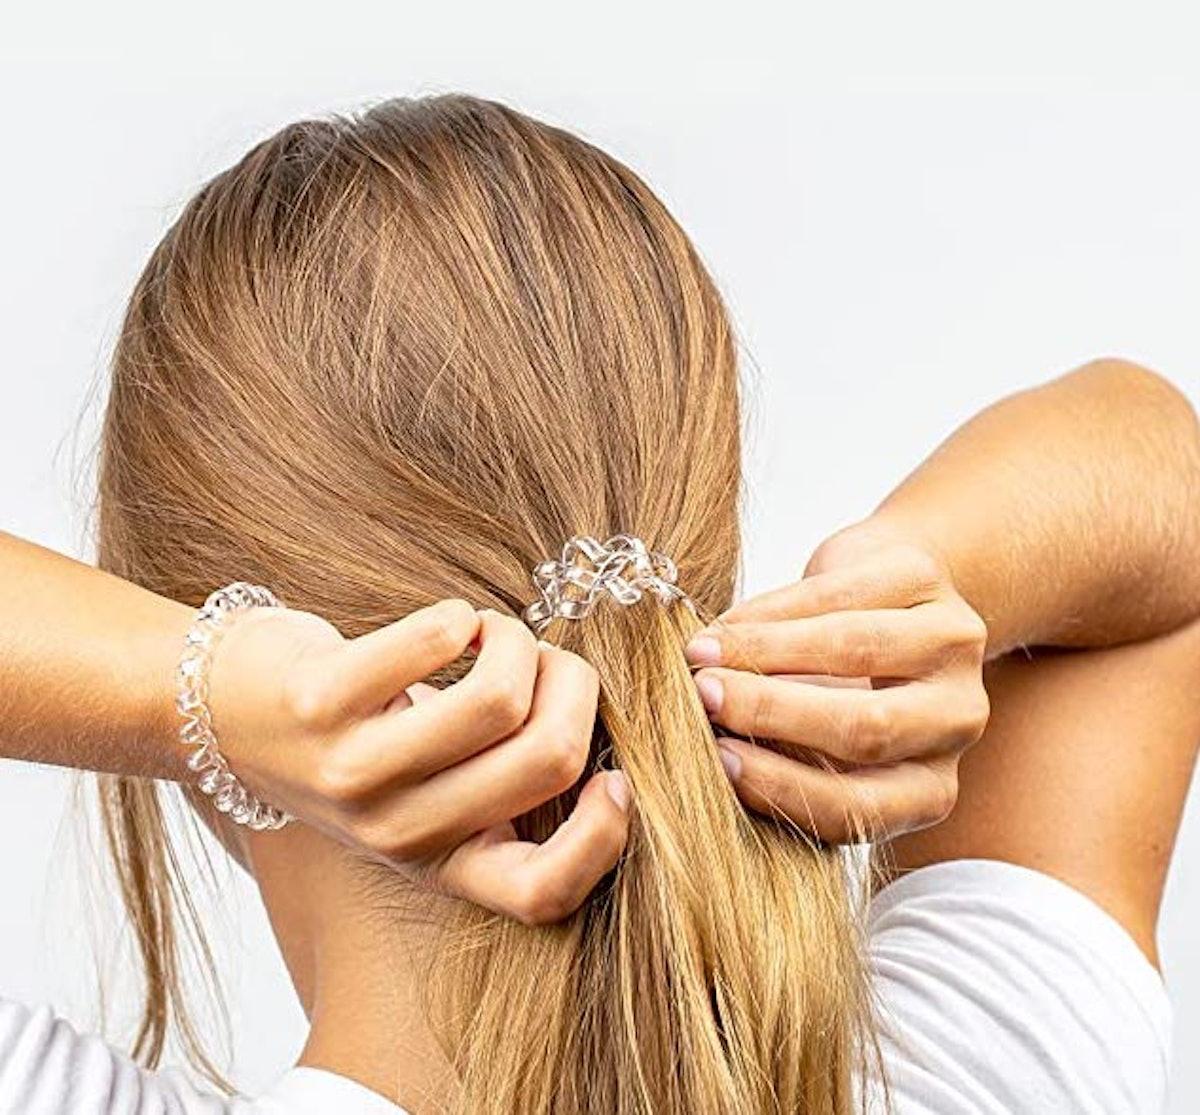 KEYCONCEPTS Spiral Hair Ties